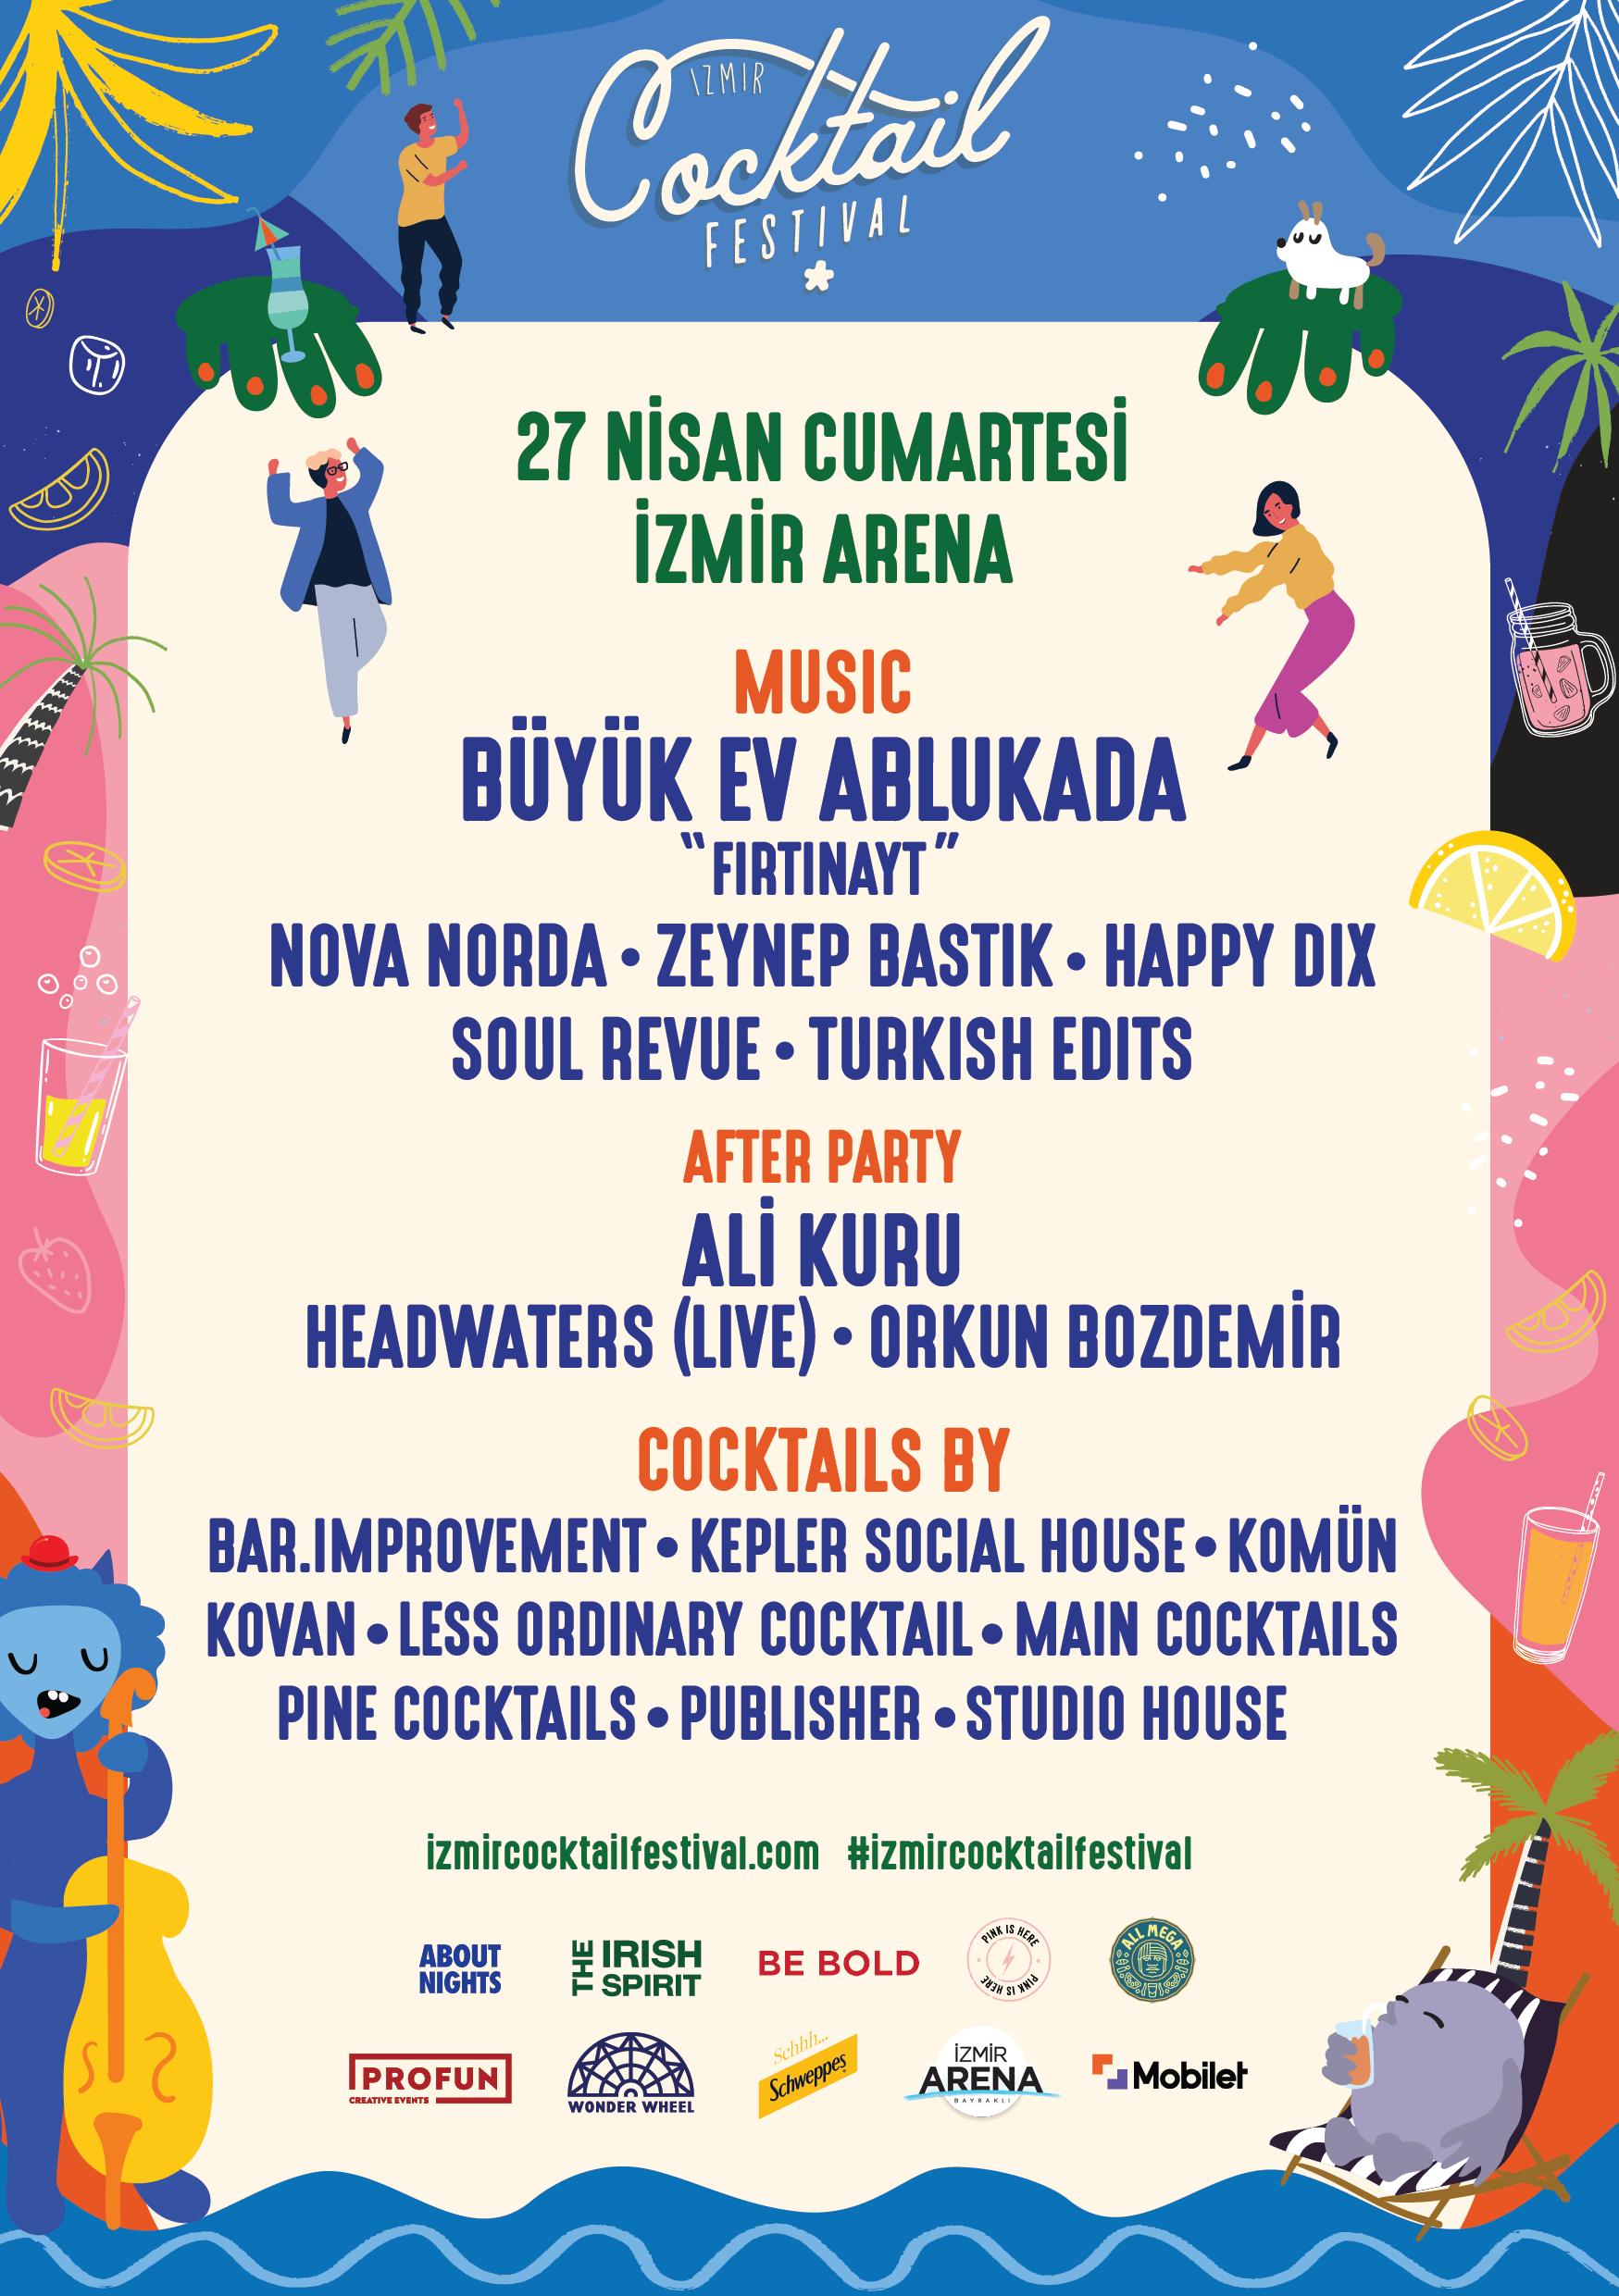 Izmir Cocktail Festival 2019